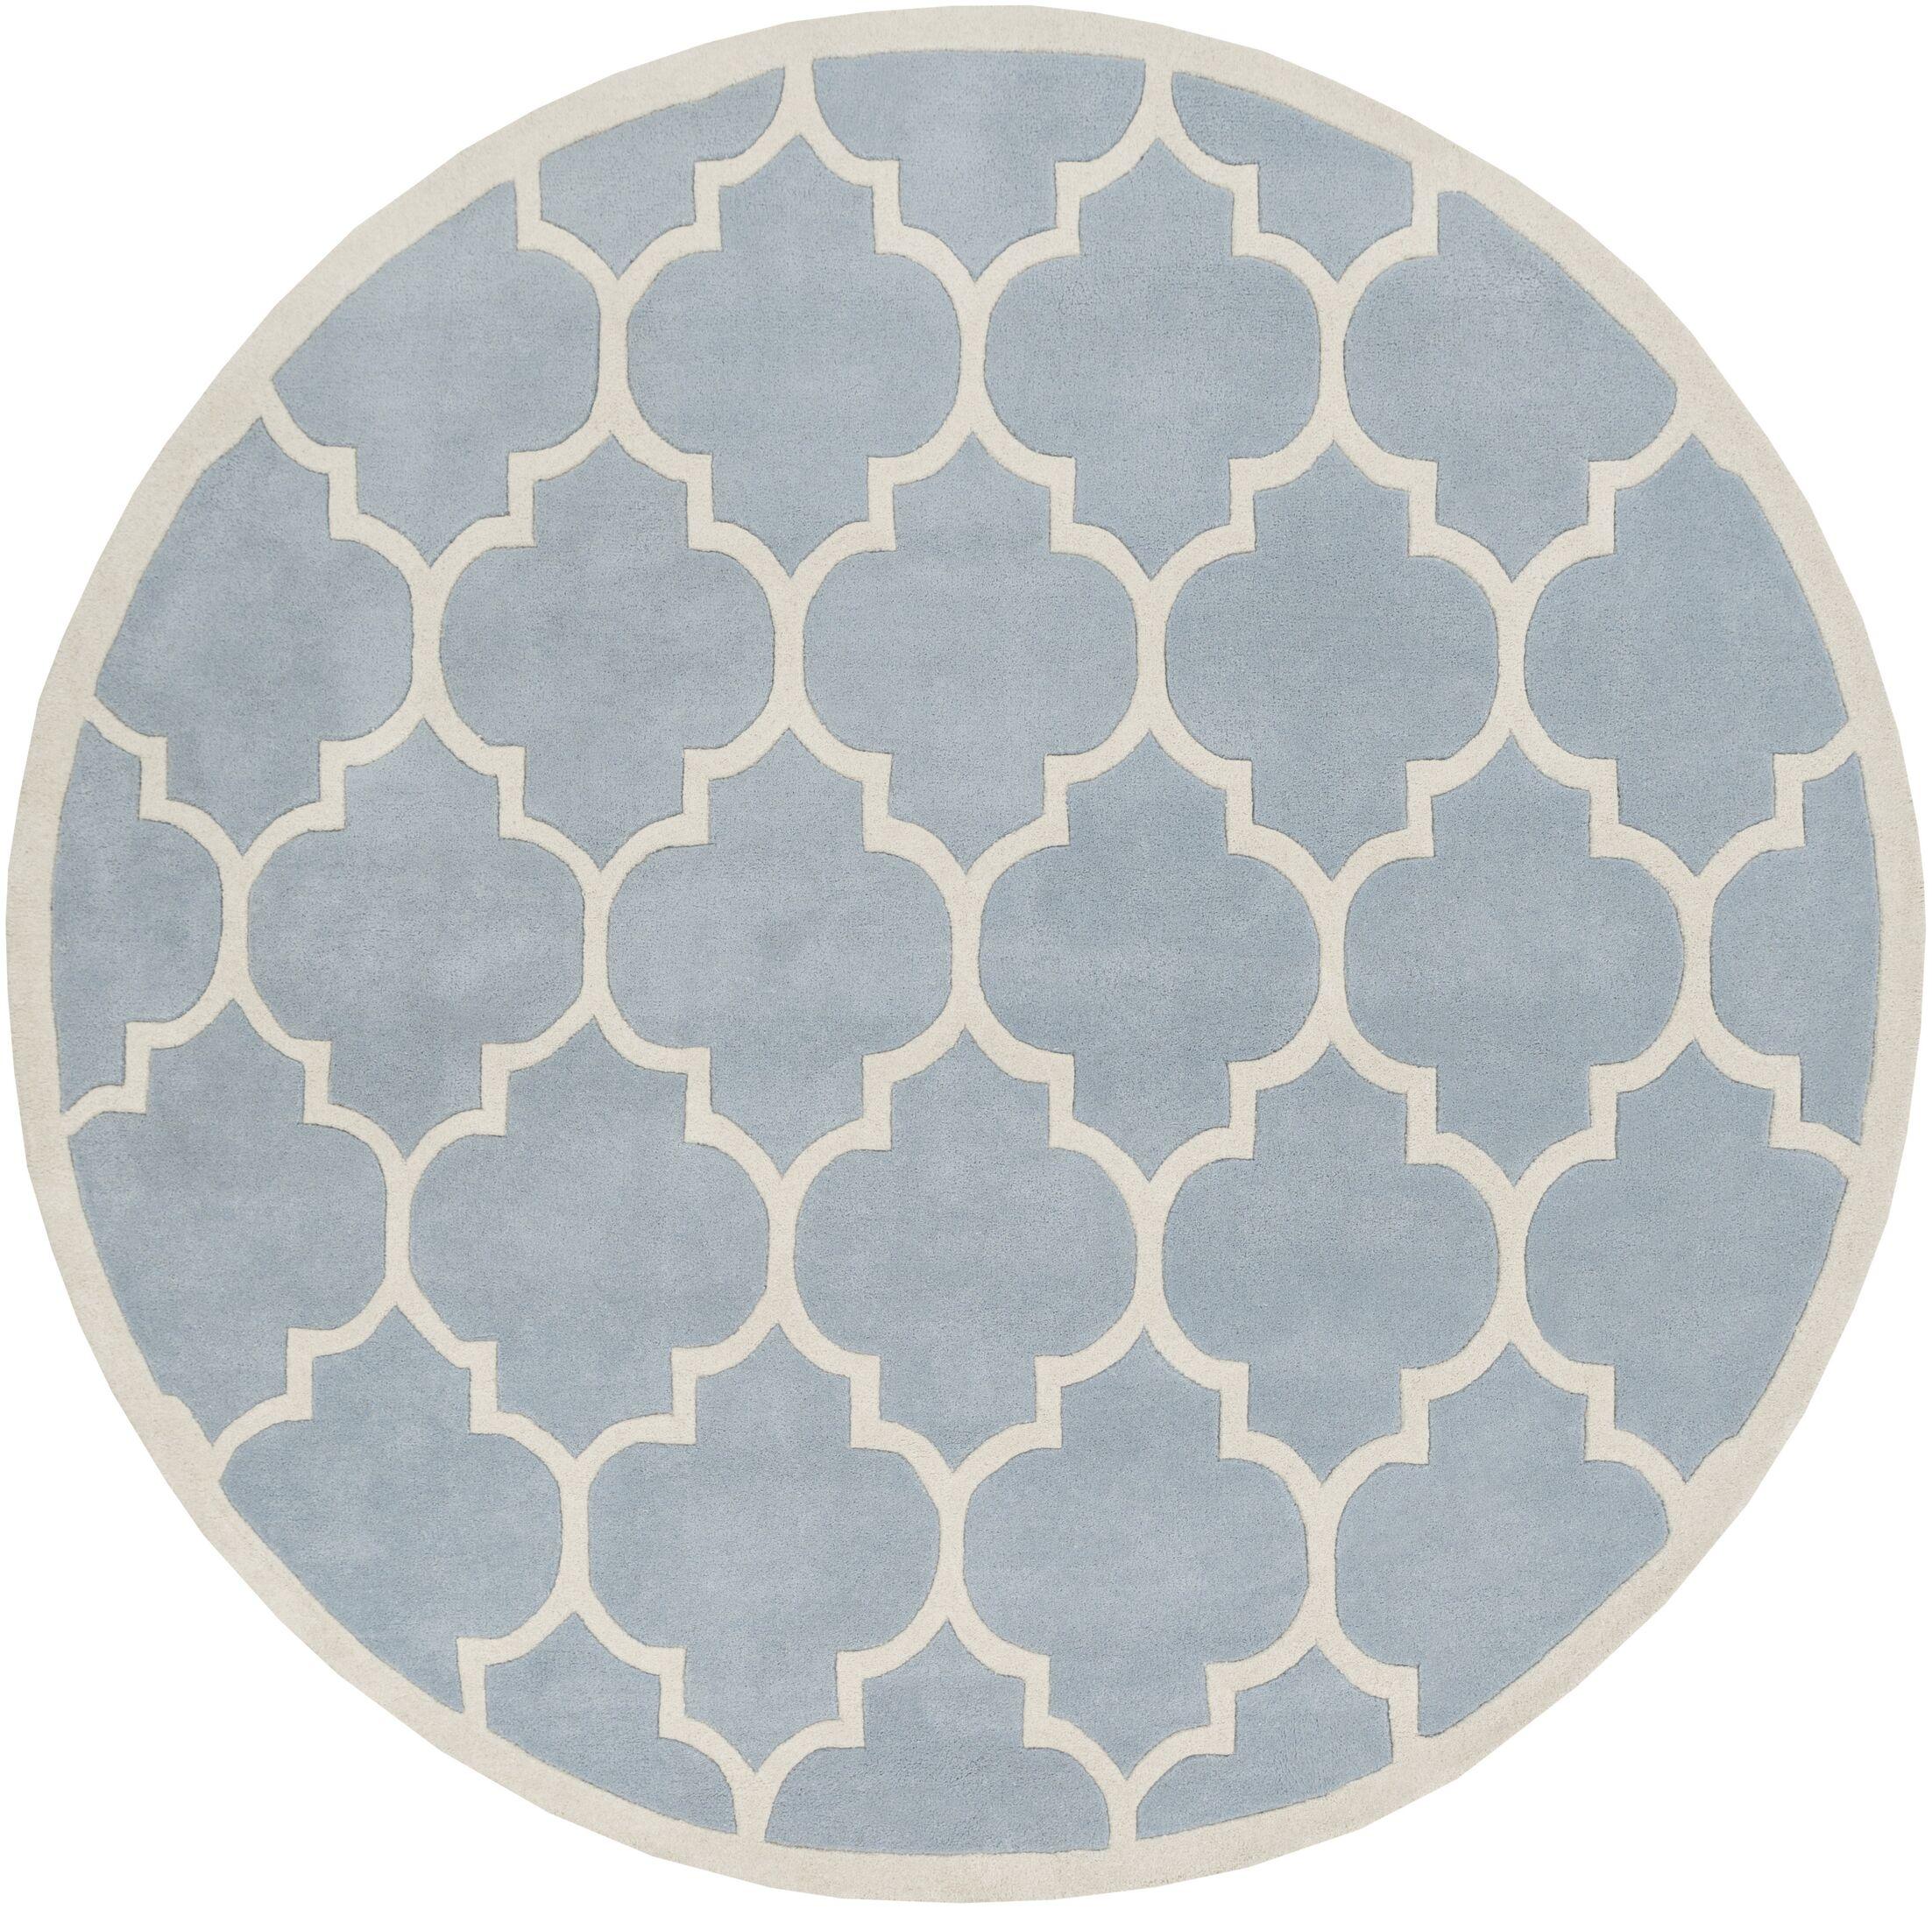 Ayler Blue Geometric Area Rug Rug Size: Round 8'